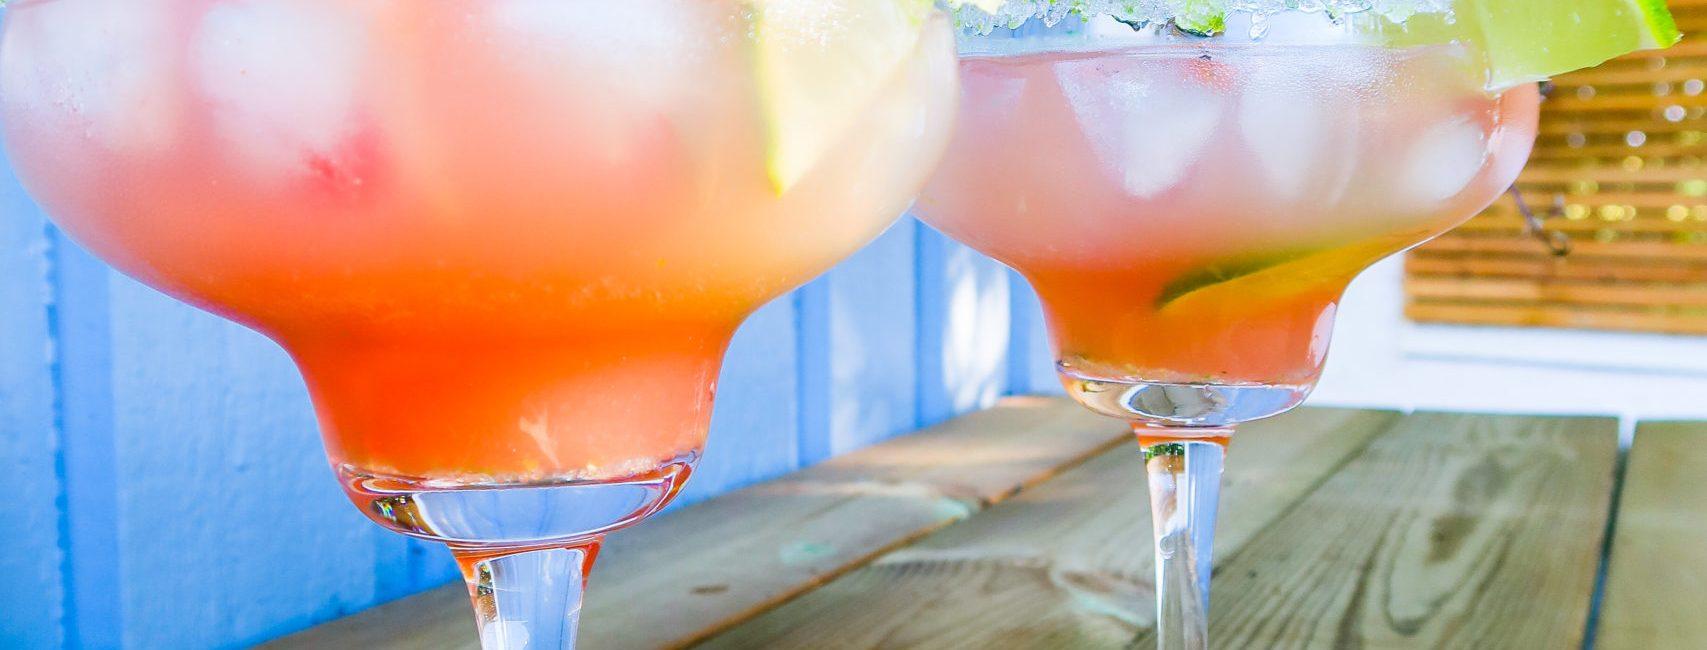 Fredagsdrinken – Grapefruit Paloma